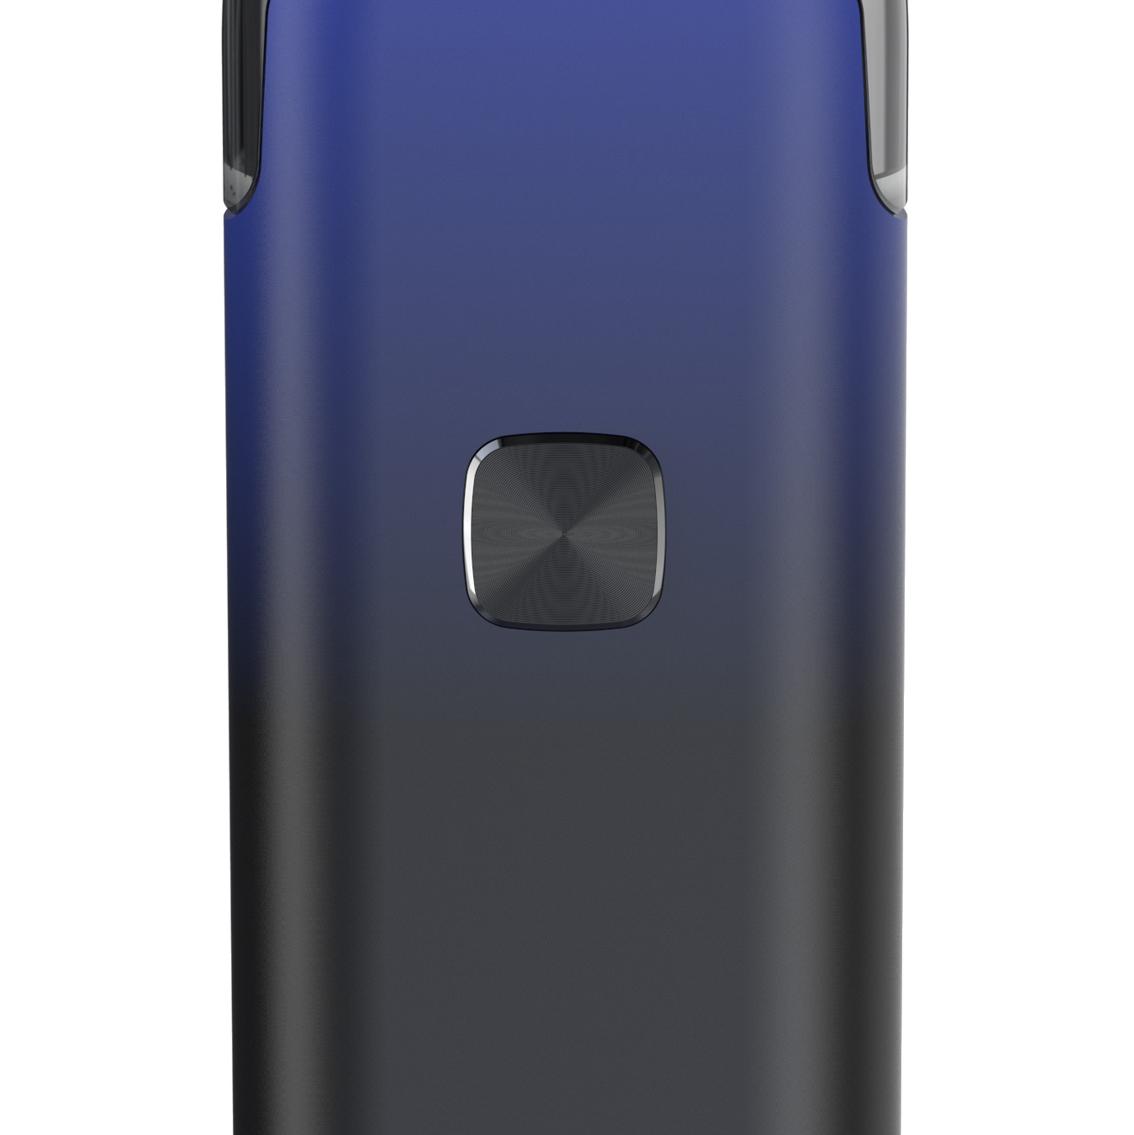 Indikátor stavu baterie u elektronická cigareta Joyetech Atopack Magic